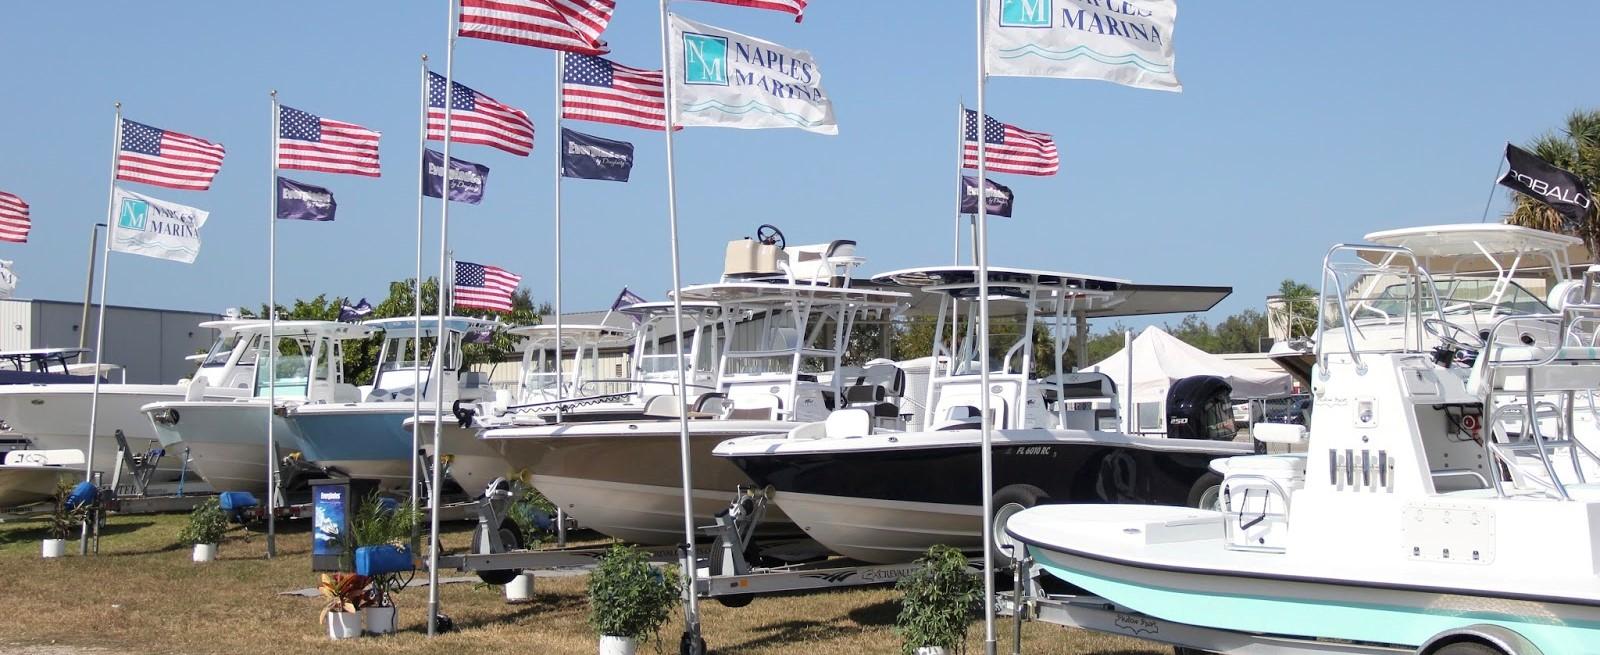 2017 Naples Boat Show